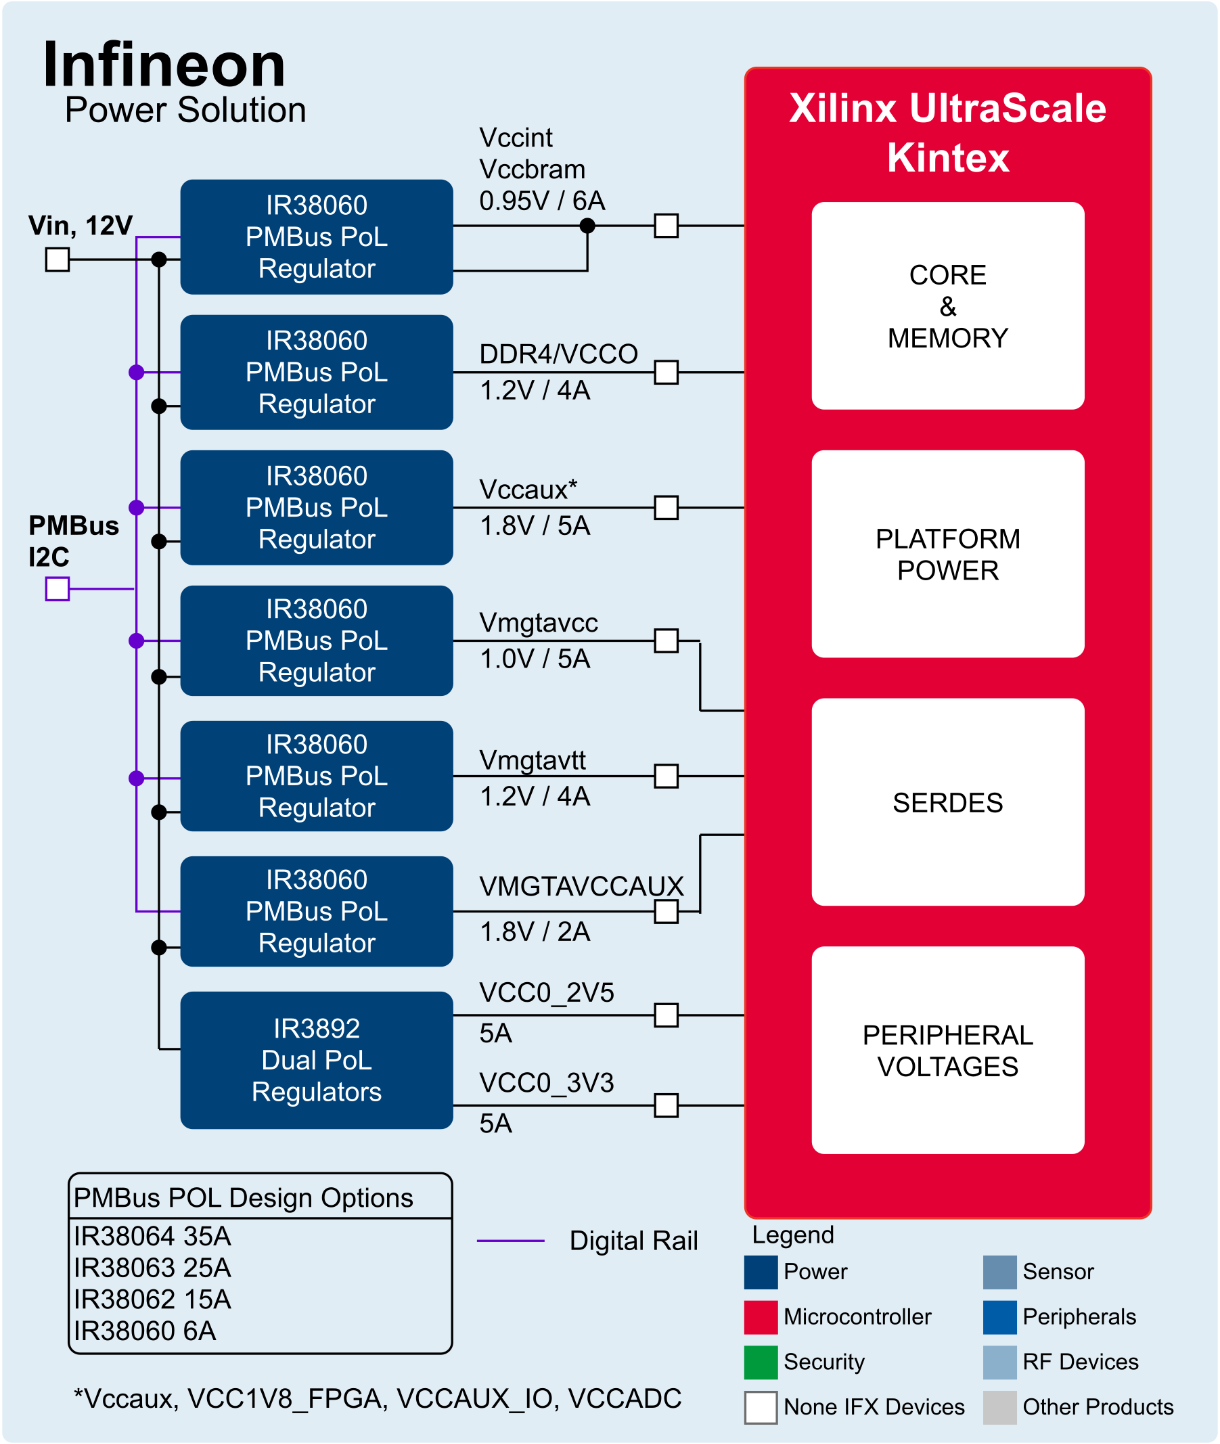 Xilinx Kintex 10w Power Design Infineon Technologies Ac Constantcurrent Source Electrical Engineering Stack Map